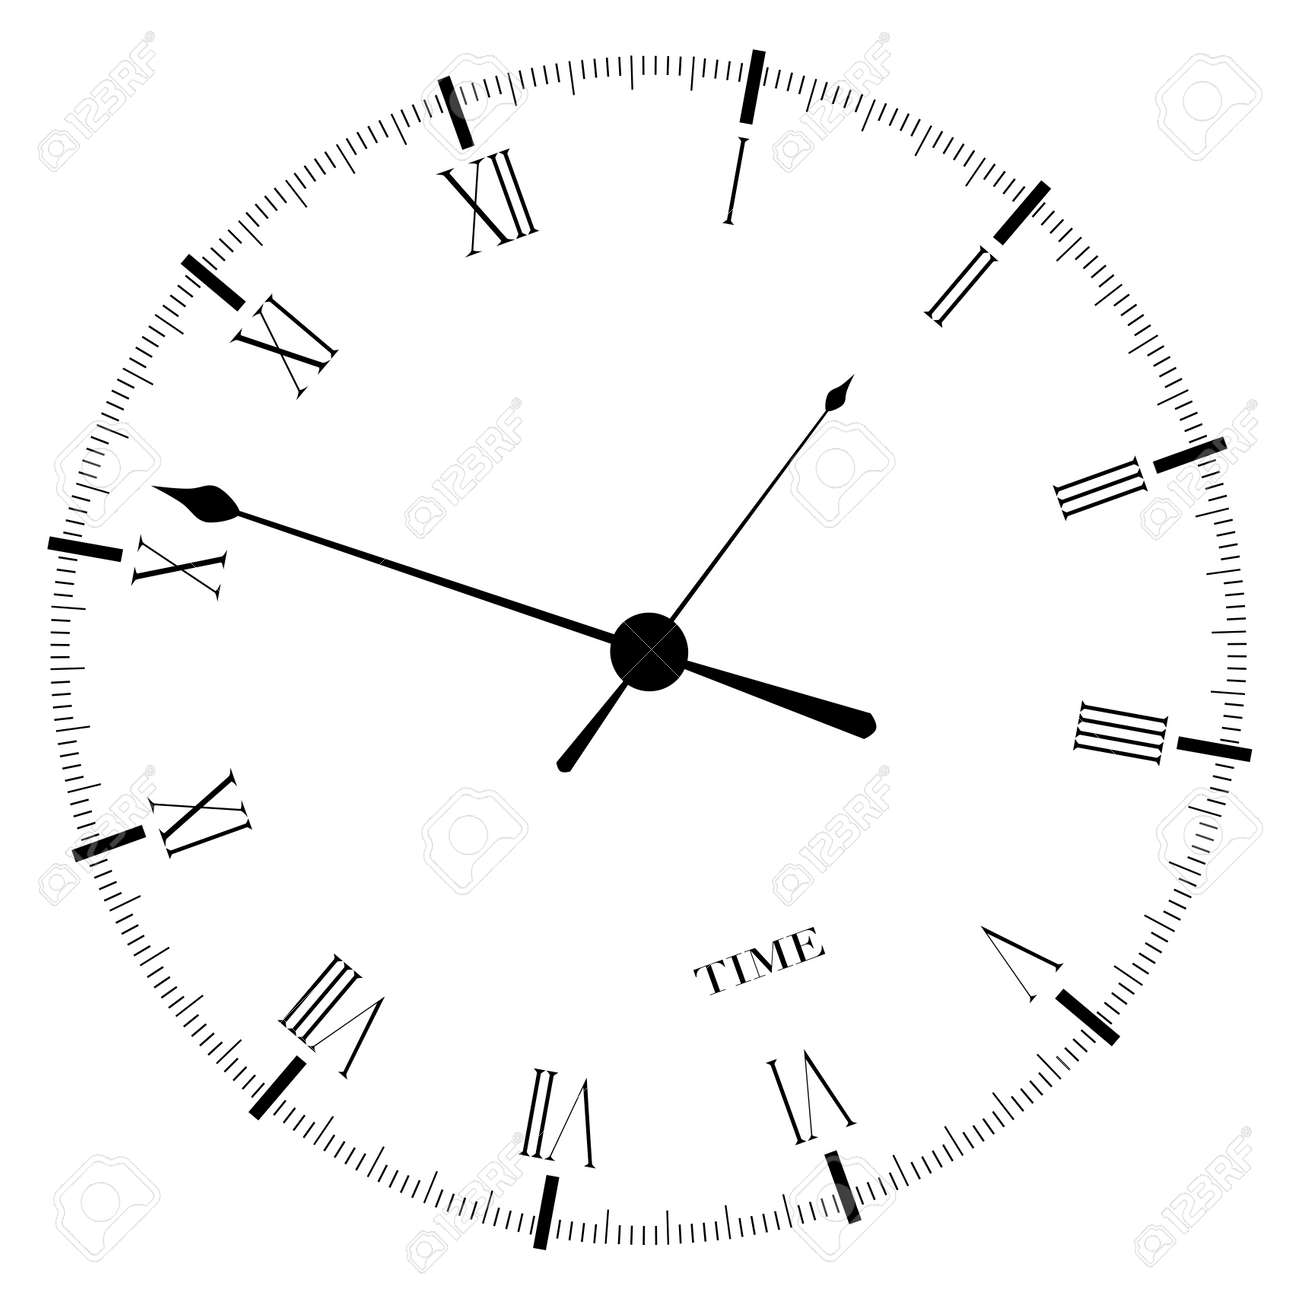 33a315d4865a Un viejo Inglés esfera del reloj del tipo de oficina aislada sobre un fondo  blanco